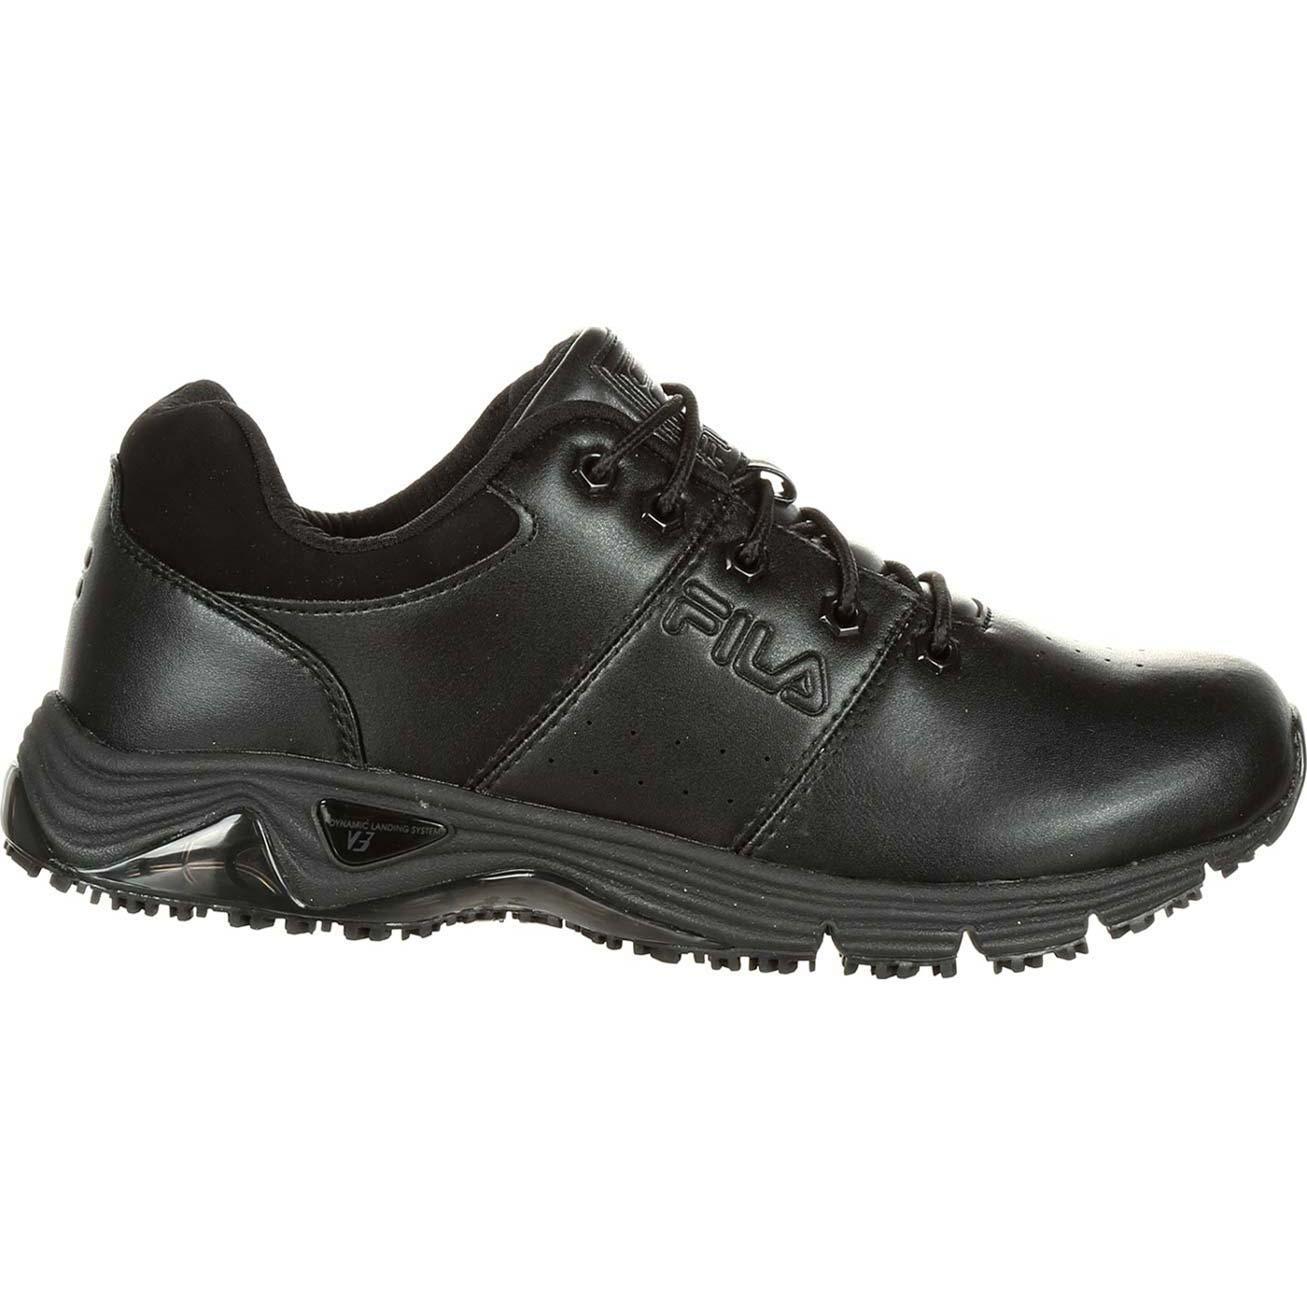 d300dd19 Fila Memory Breach Steel Toe Slip-Resistant Work Athletic Shoe